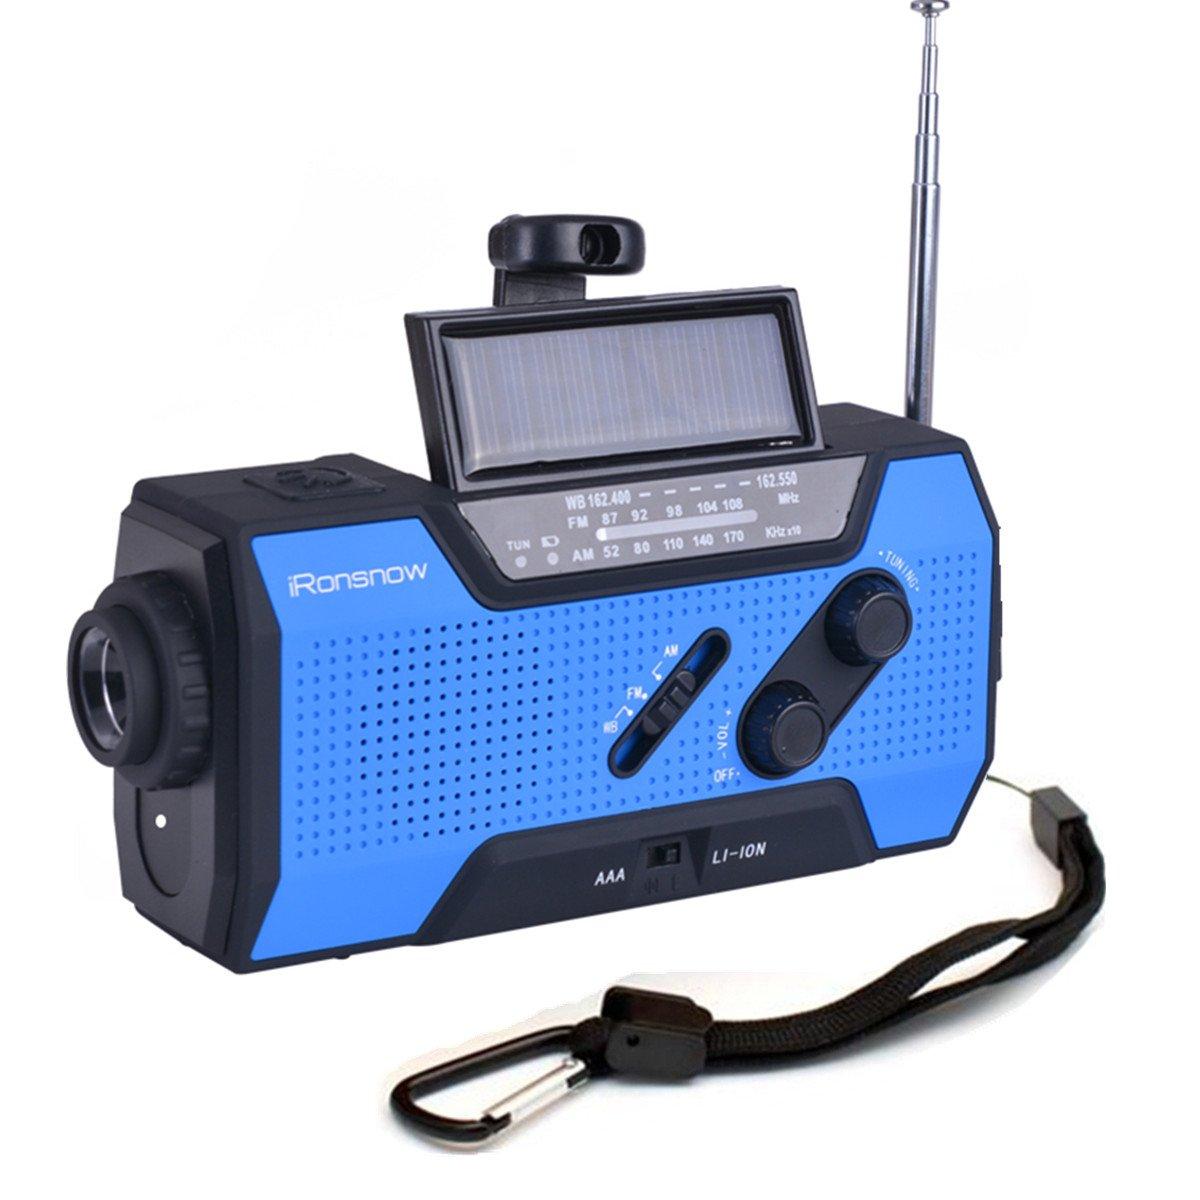 iRonsnow IS-090 Dynamo Emergency Solar Hand Crank Self Powered AM/FM/NOAA Weather Radio, with 2000mAh Power Bank, Flashlight, Reading Lamp and SOS Alarm (Blue)